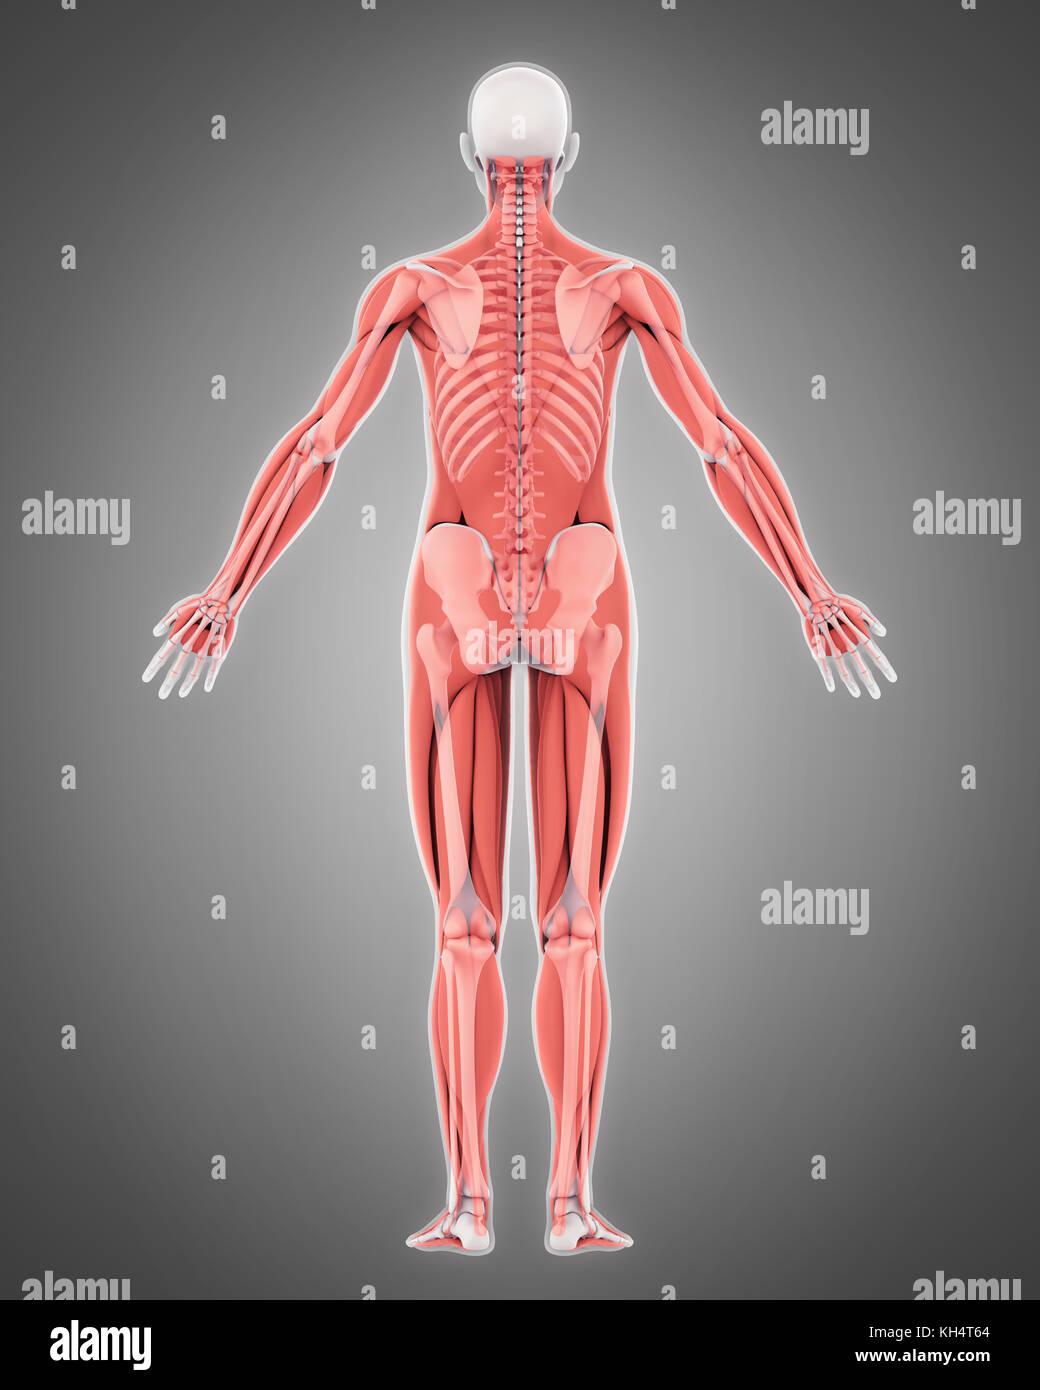 Skeletal Muscle Stock Photos & Skeletal Muscle Stock ...